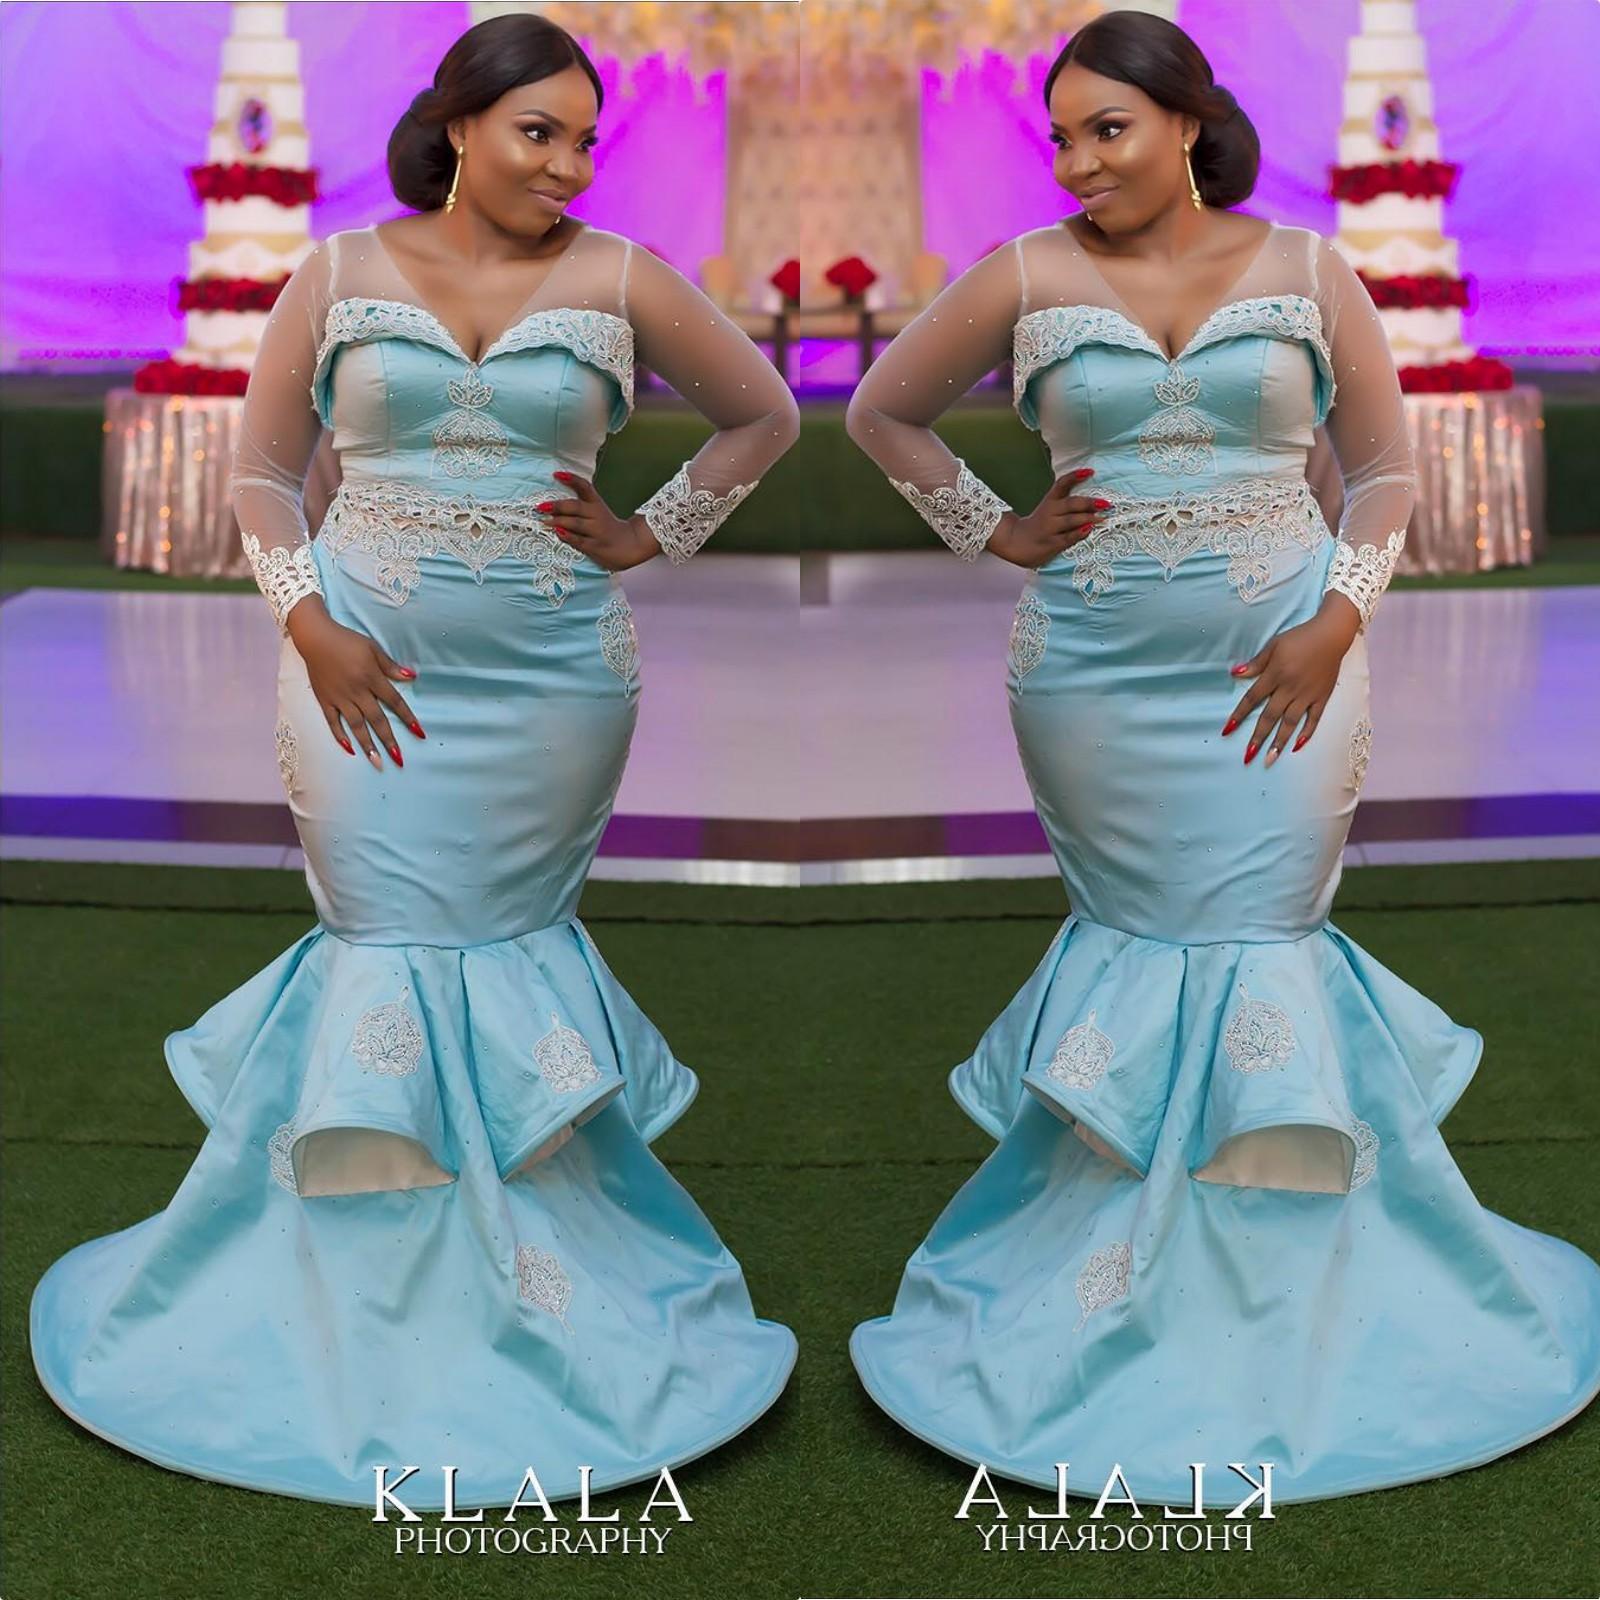 Amazing new Kitchen party dress styles | fashenista